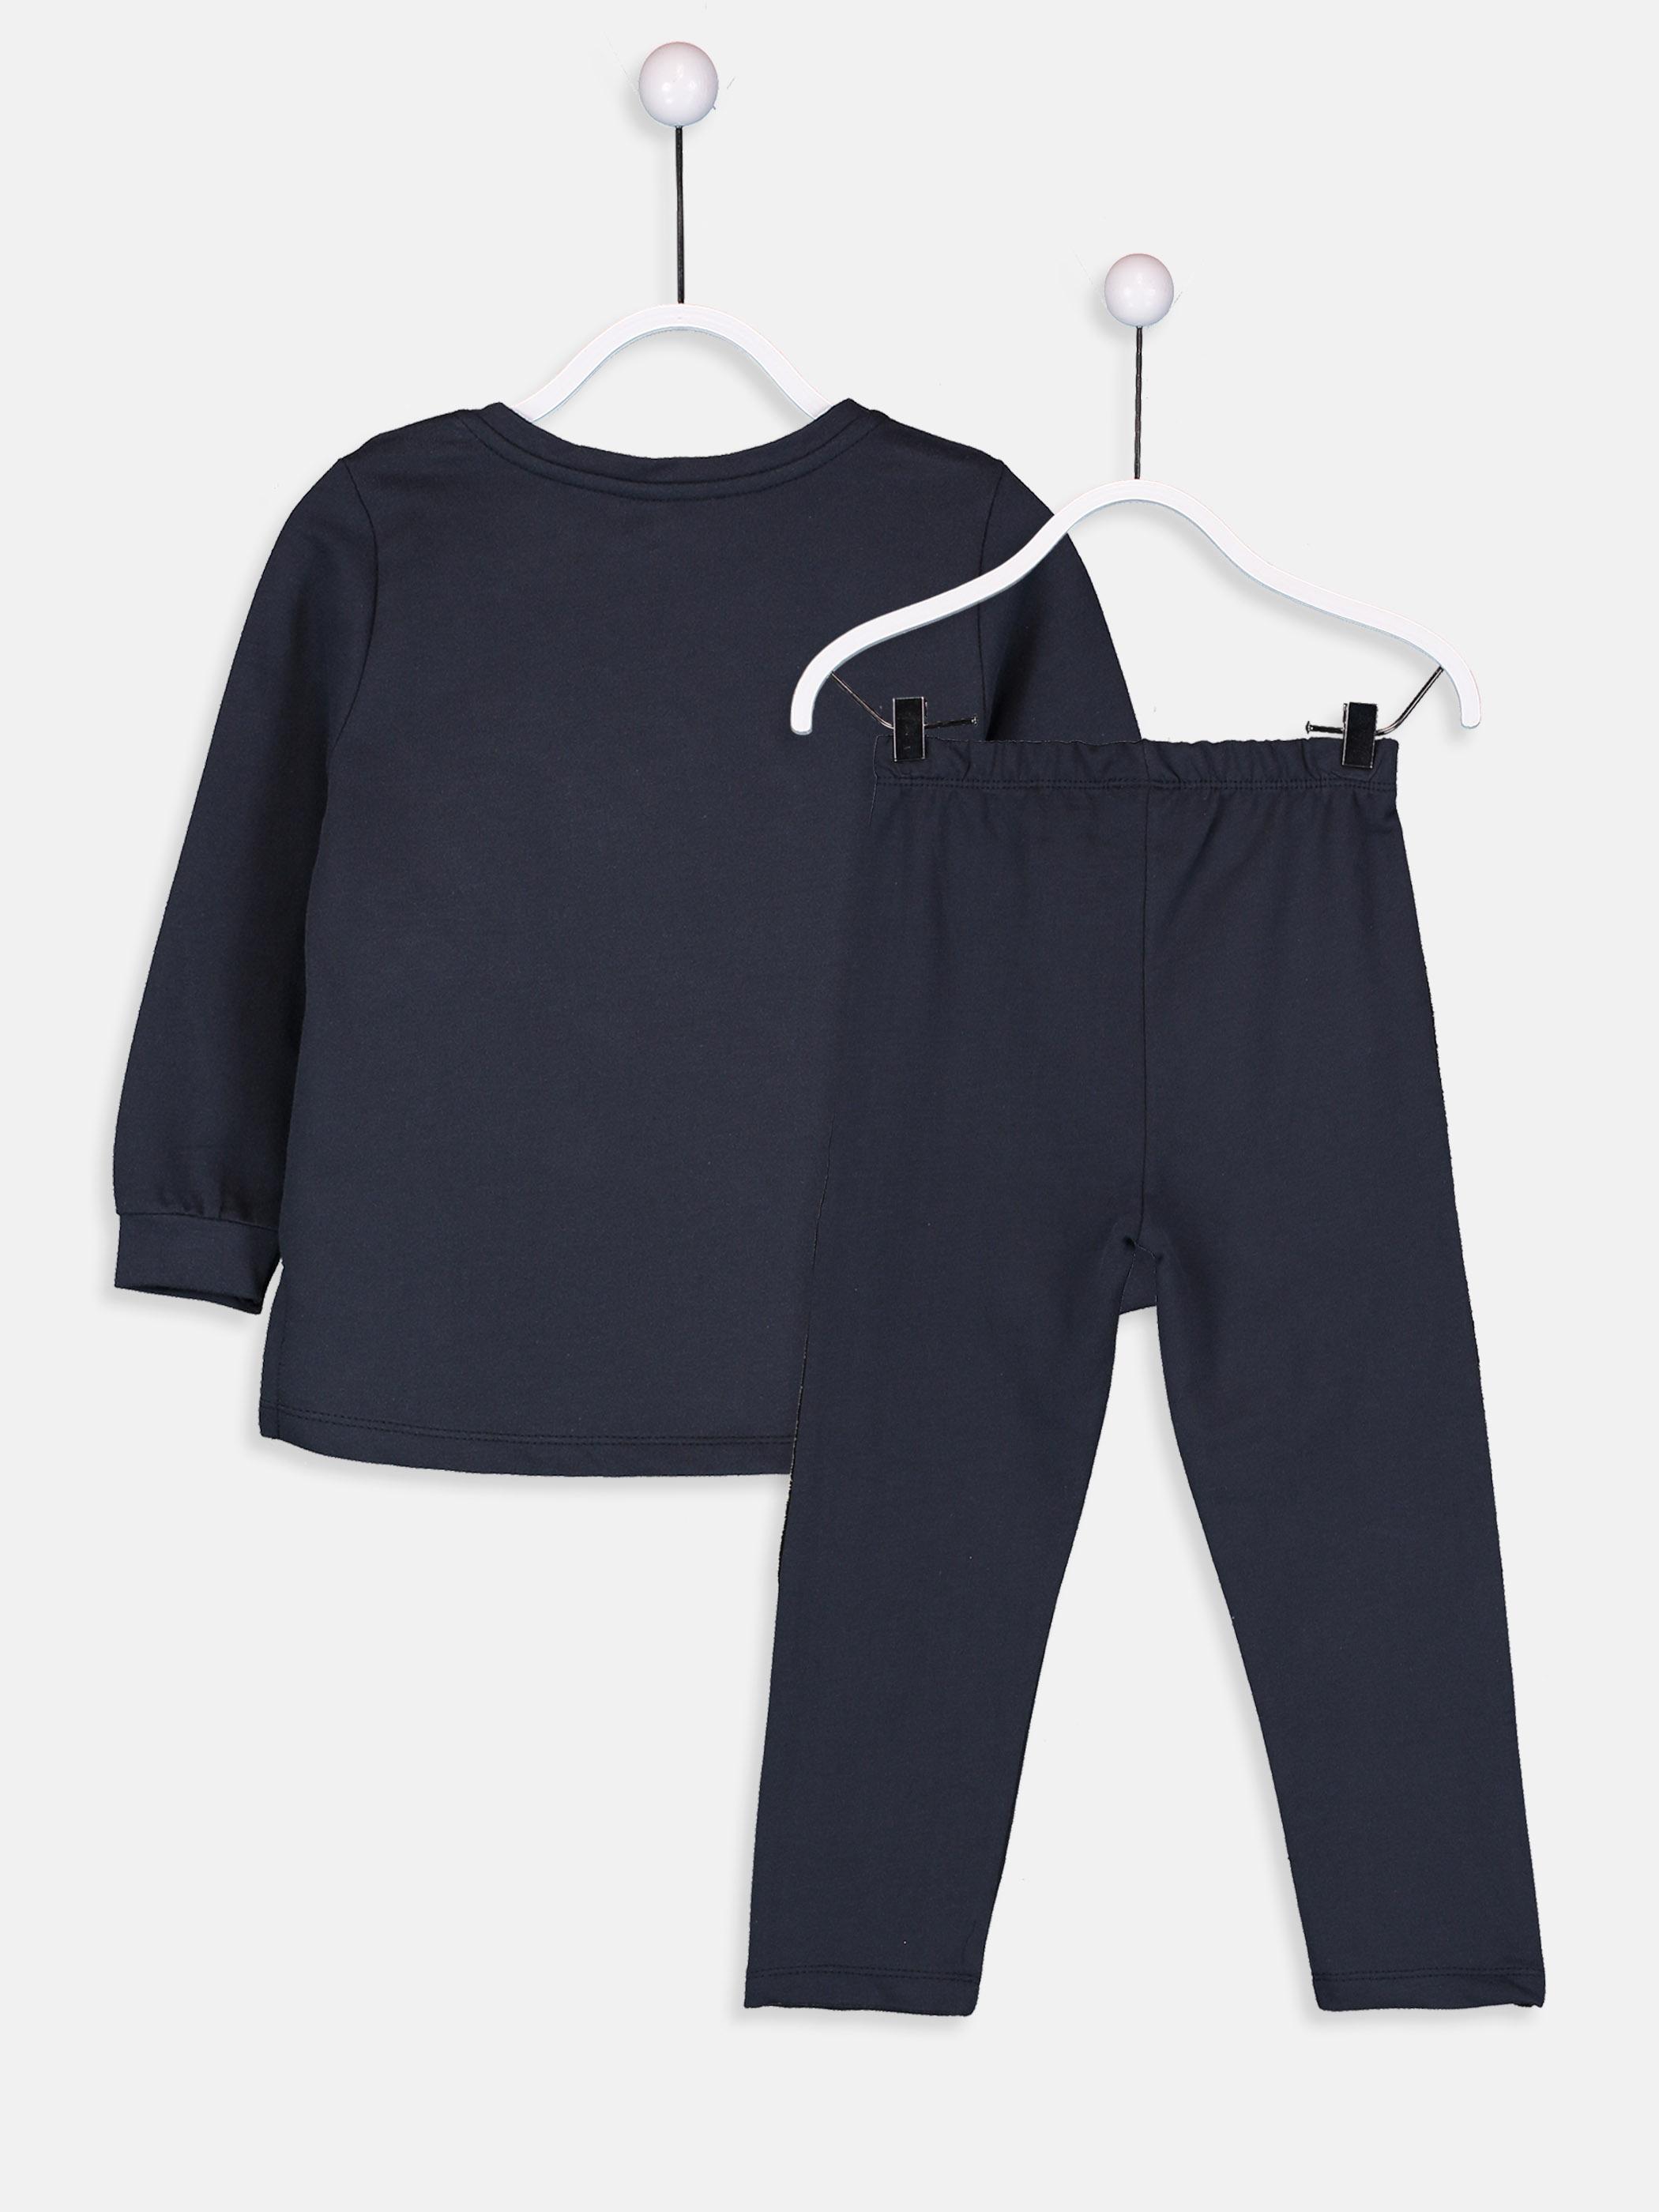 Kız Çocuk Çift Yönlü Payetli Pijama Takımı -8W6560Z4-HJB